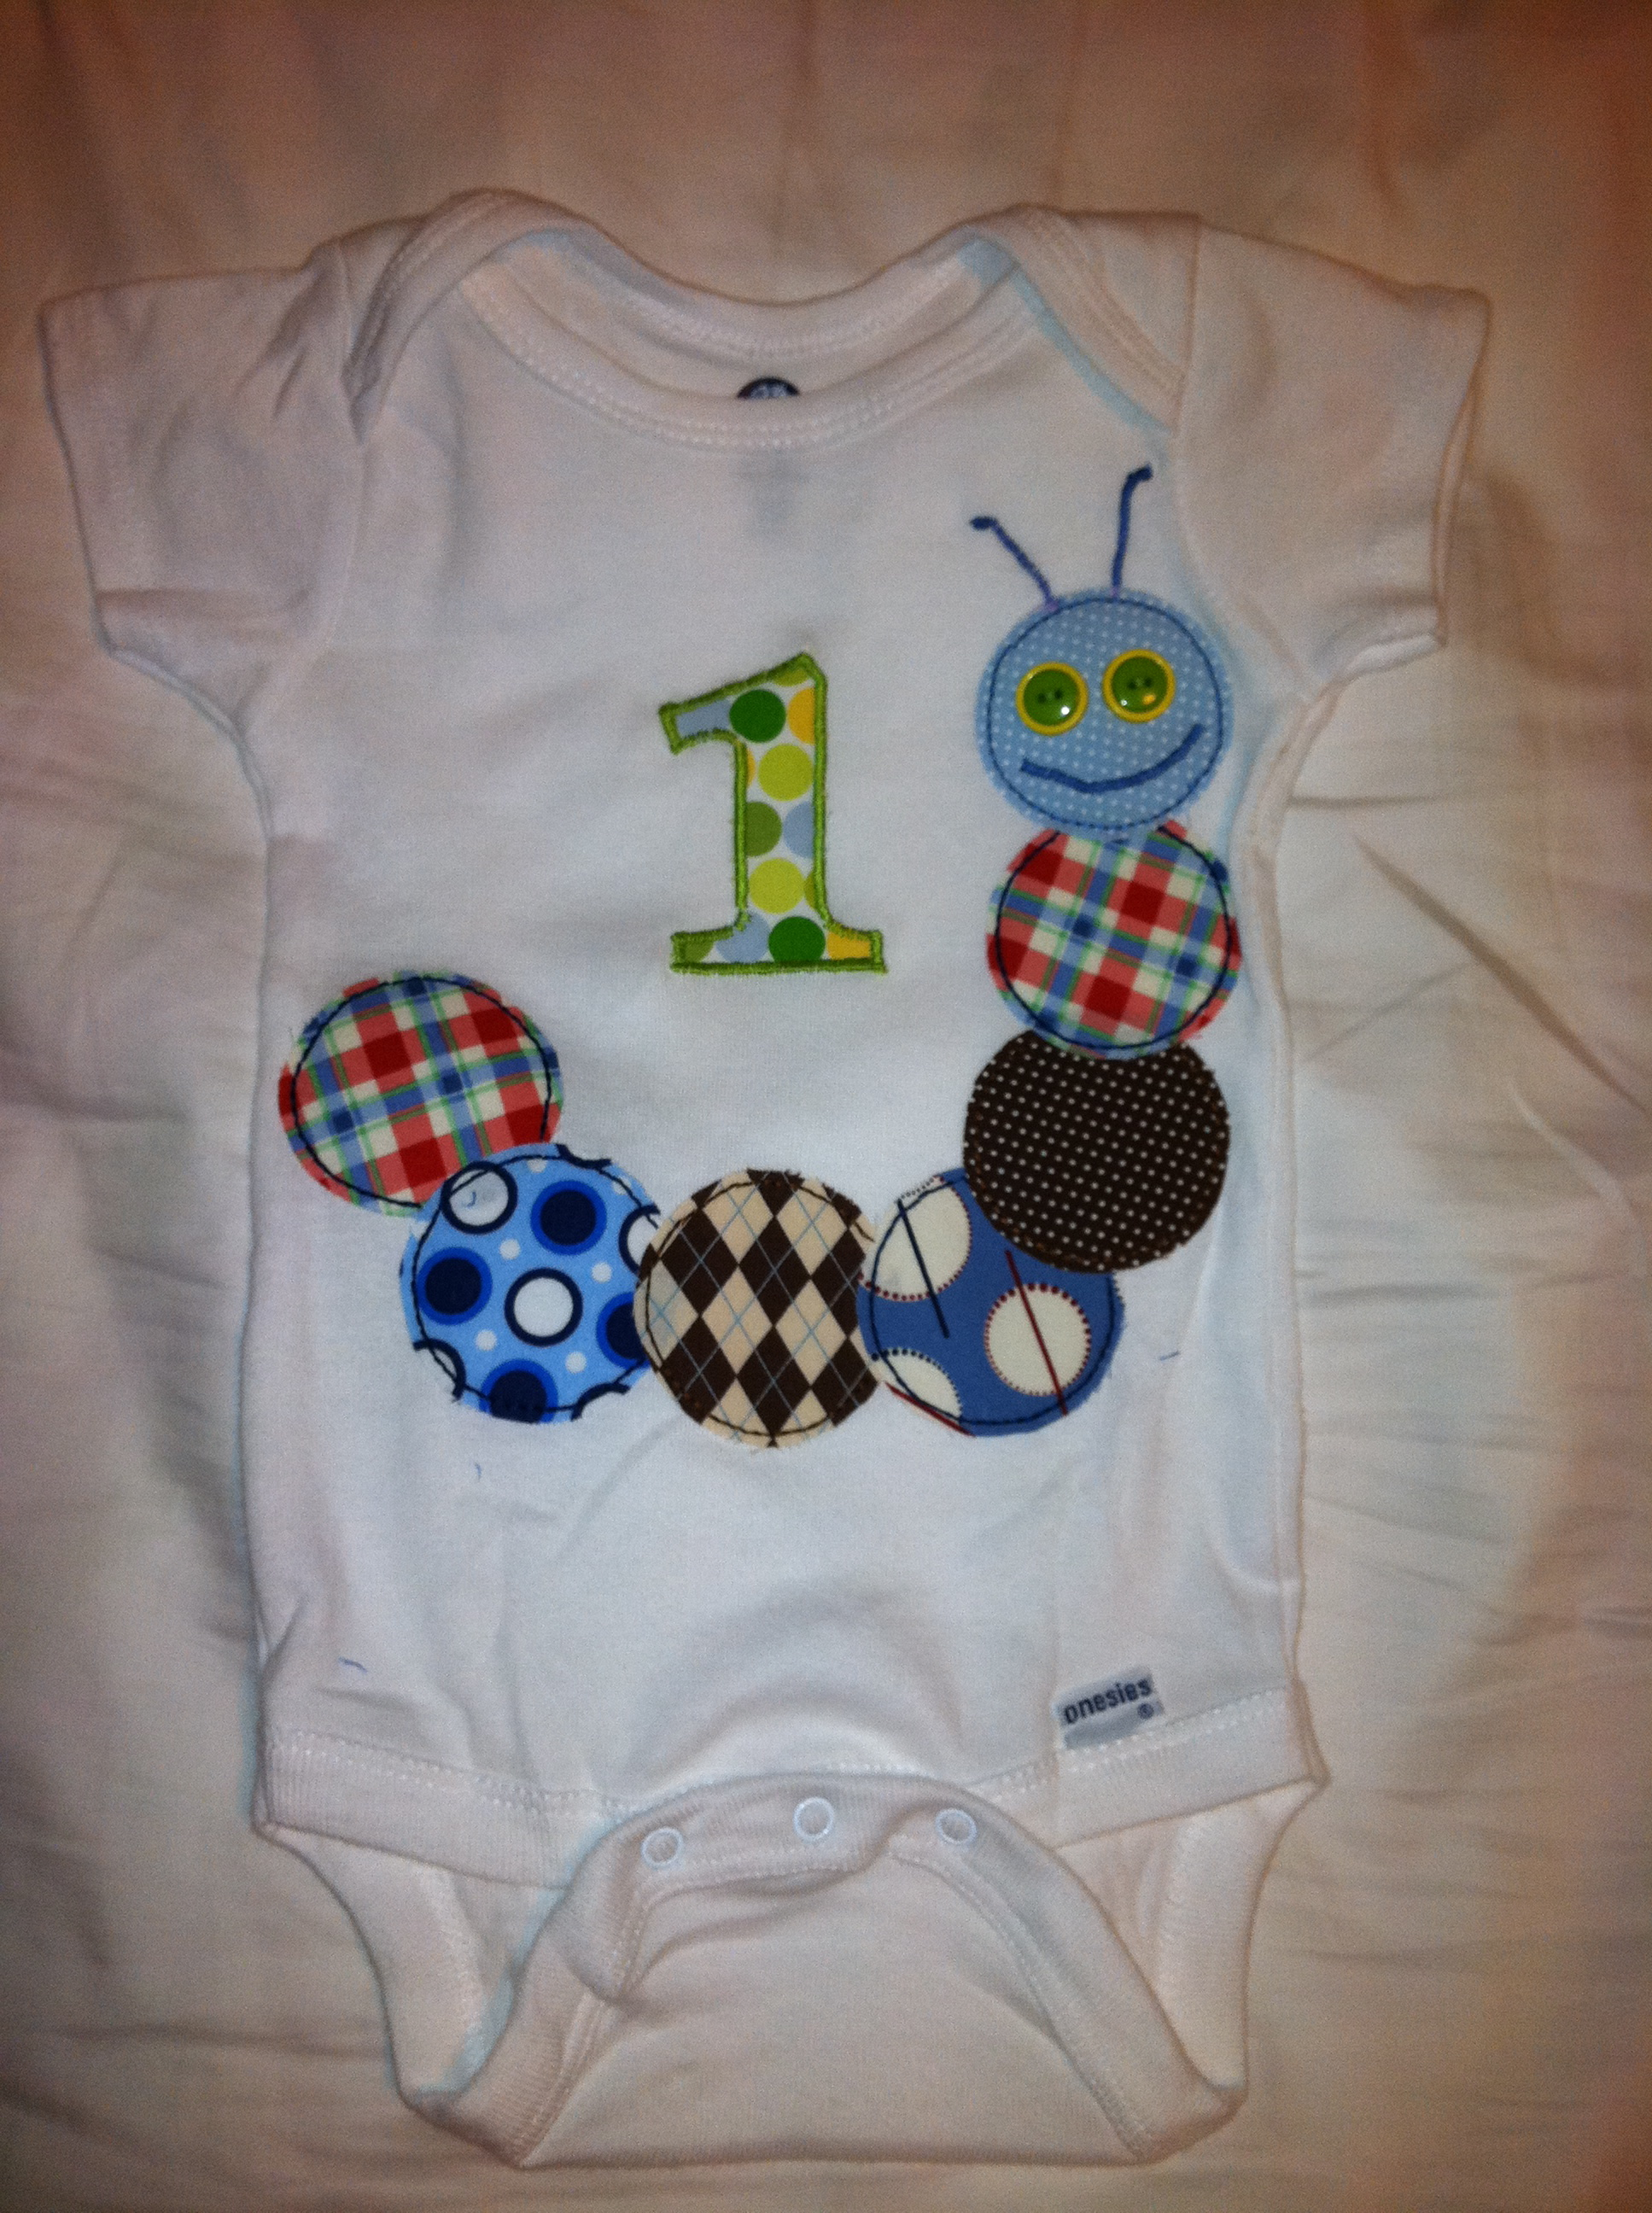 One Year Old Caterpillar Birthday Shirt